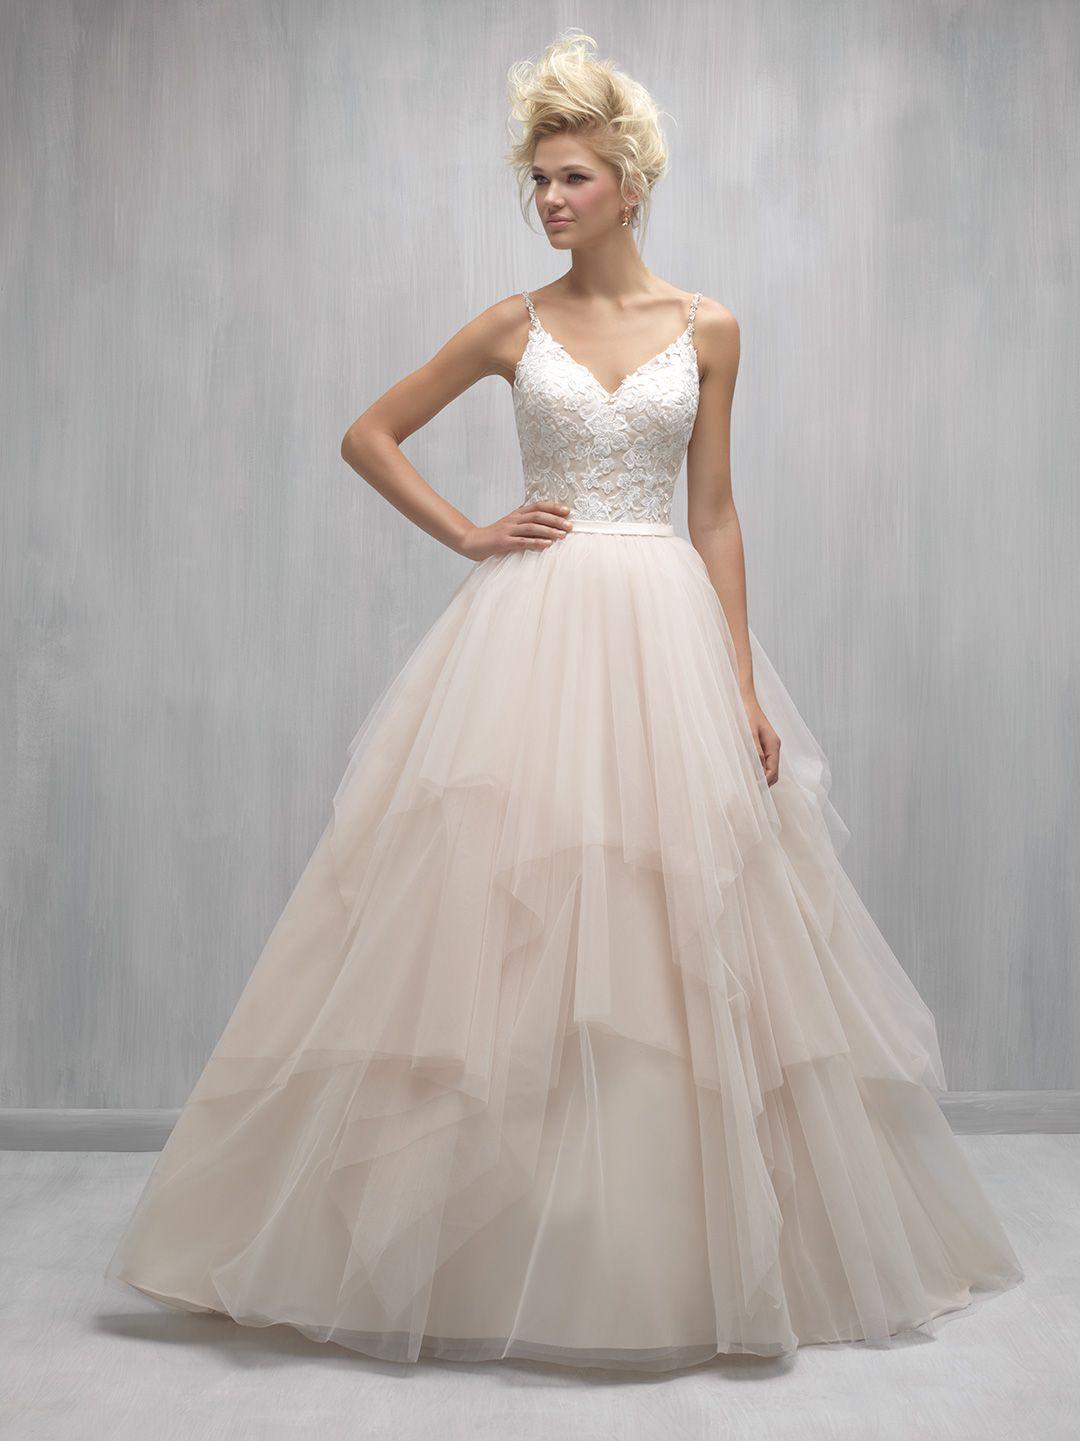 SAMPLE SALE IvoryChampagne (BLUSH) Bridal Size 10